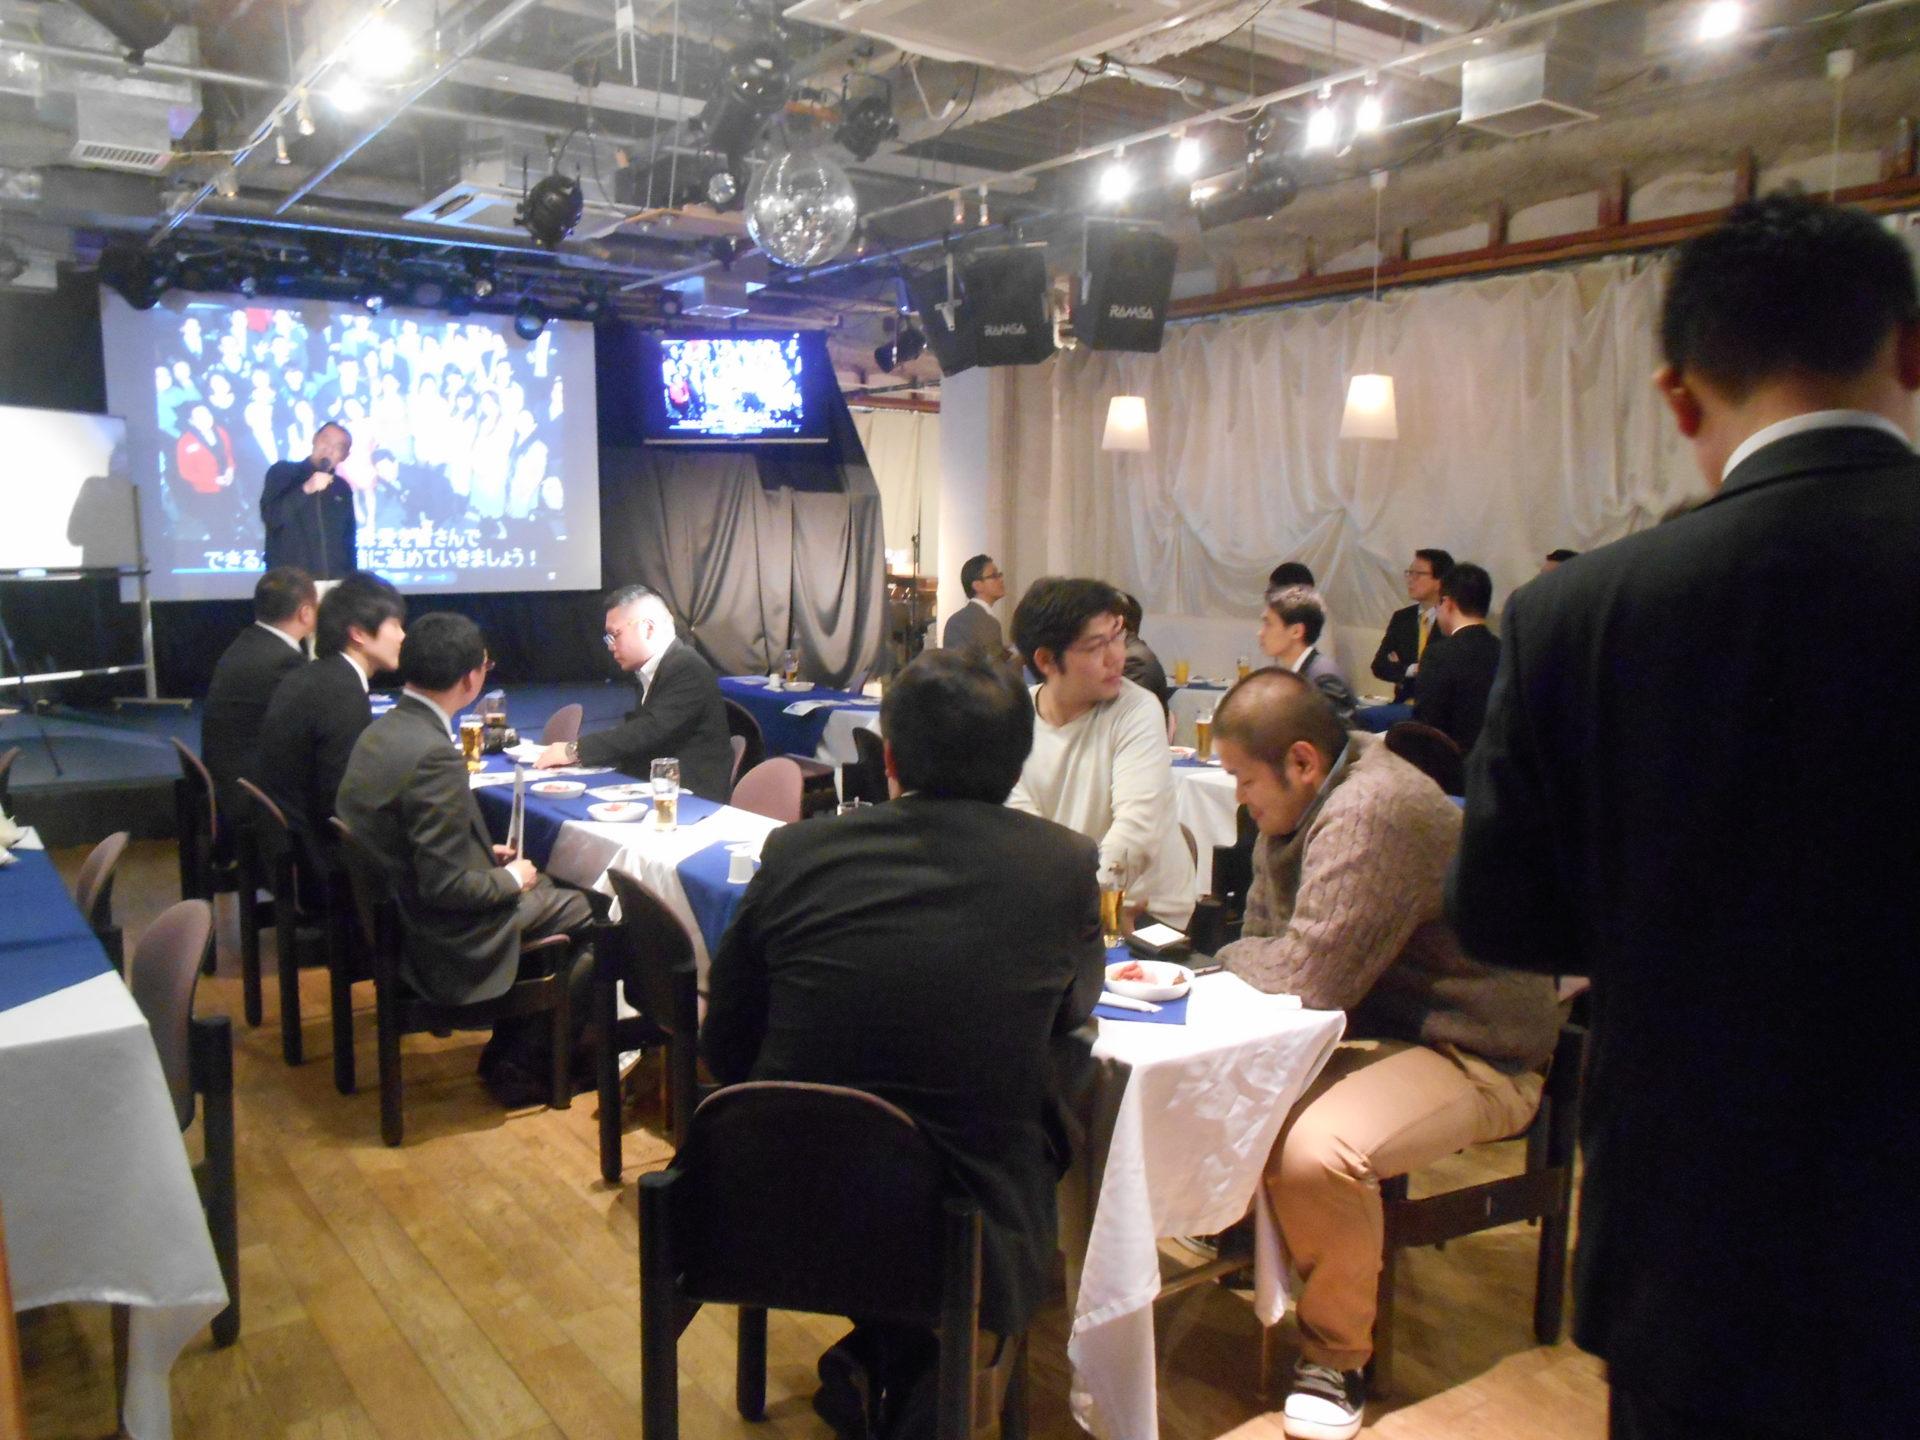 DSCN1058 1920x1440 - 2016年3月11日(金)AOsuki総会&パーティー開催しました。